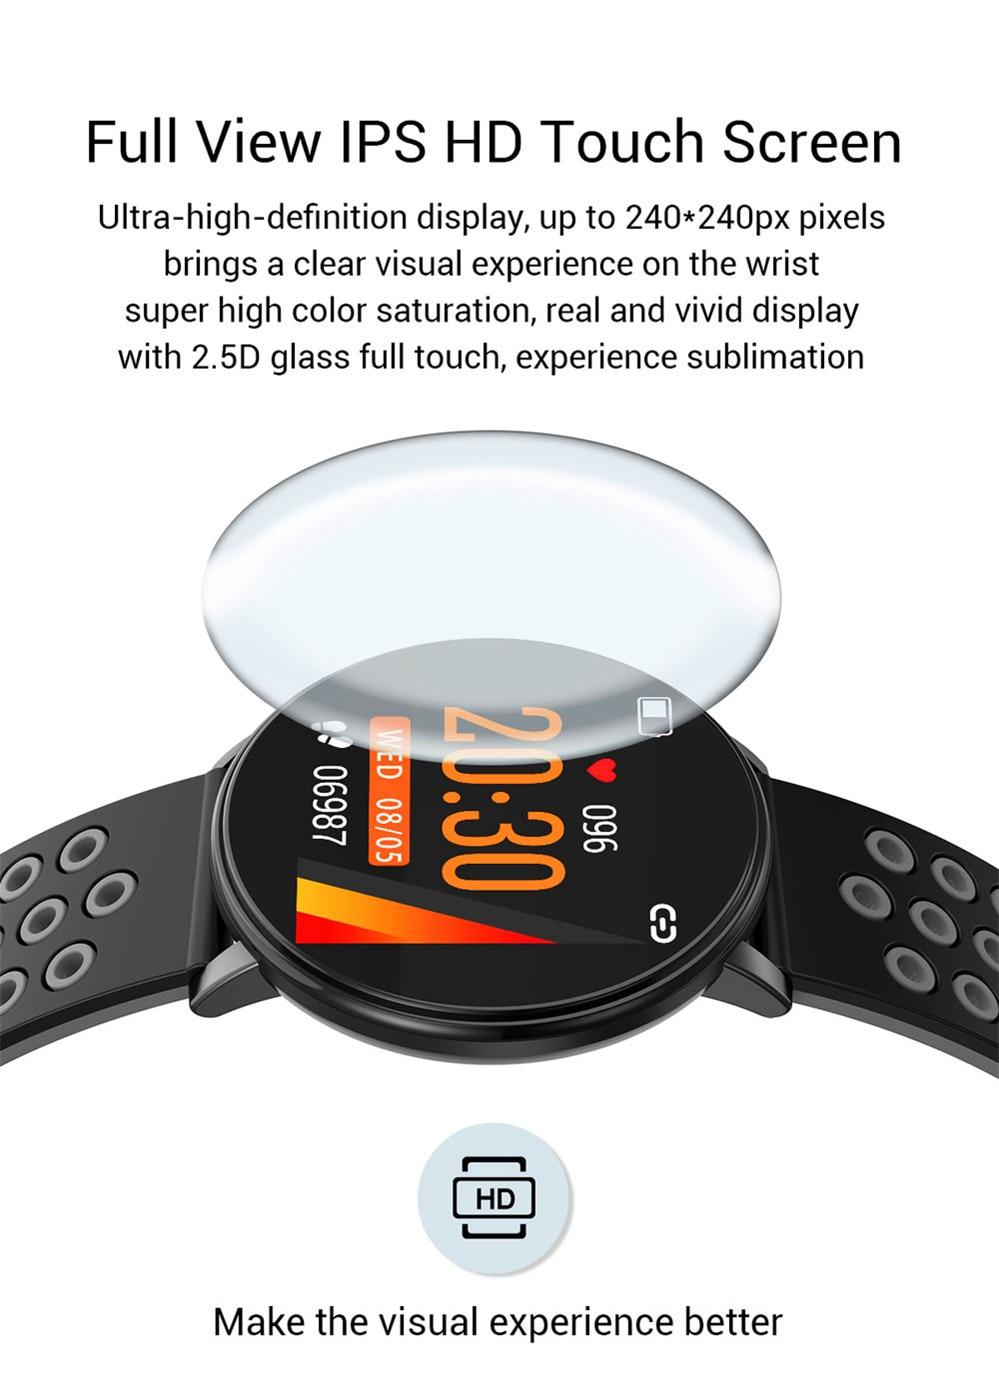 Hd980877e9aa149c090398c983b20c547v Smart Fitness Bracelet Blood Pressure Measurement Fitness Tracker Waterproof IP67 Smart Band Watch Heart Rate Monitor Pedometer